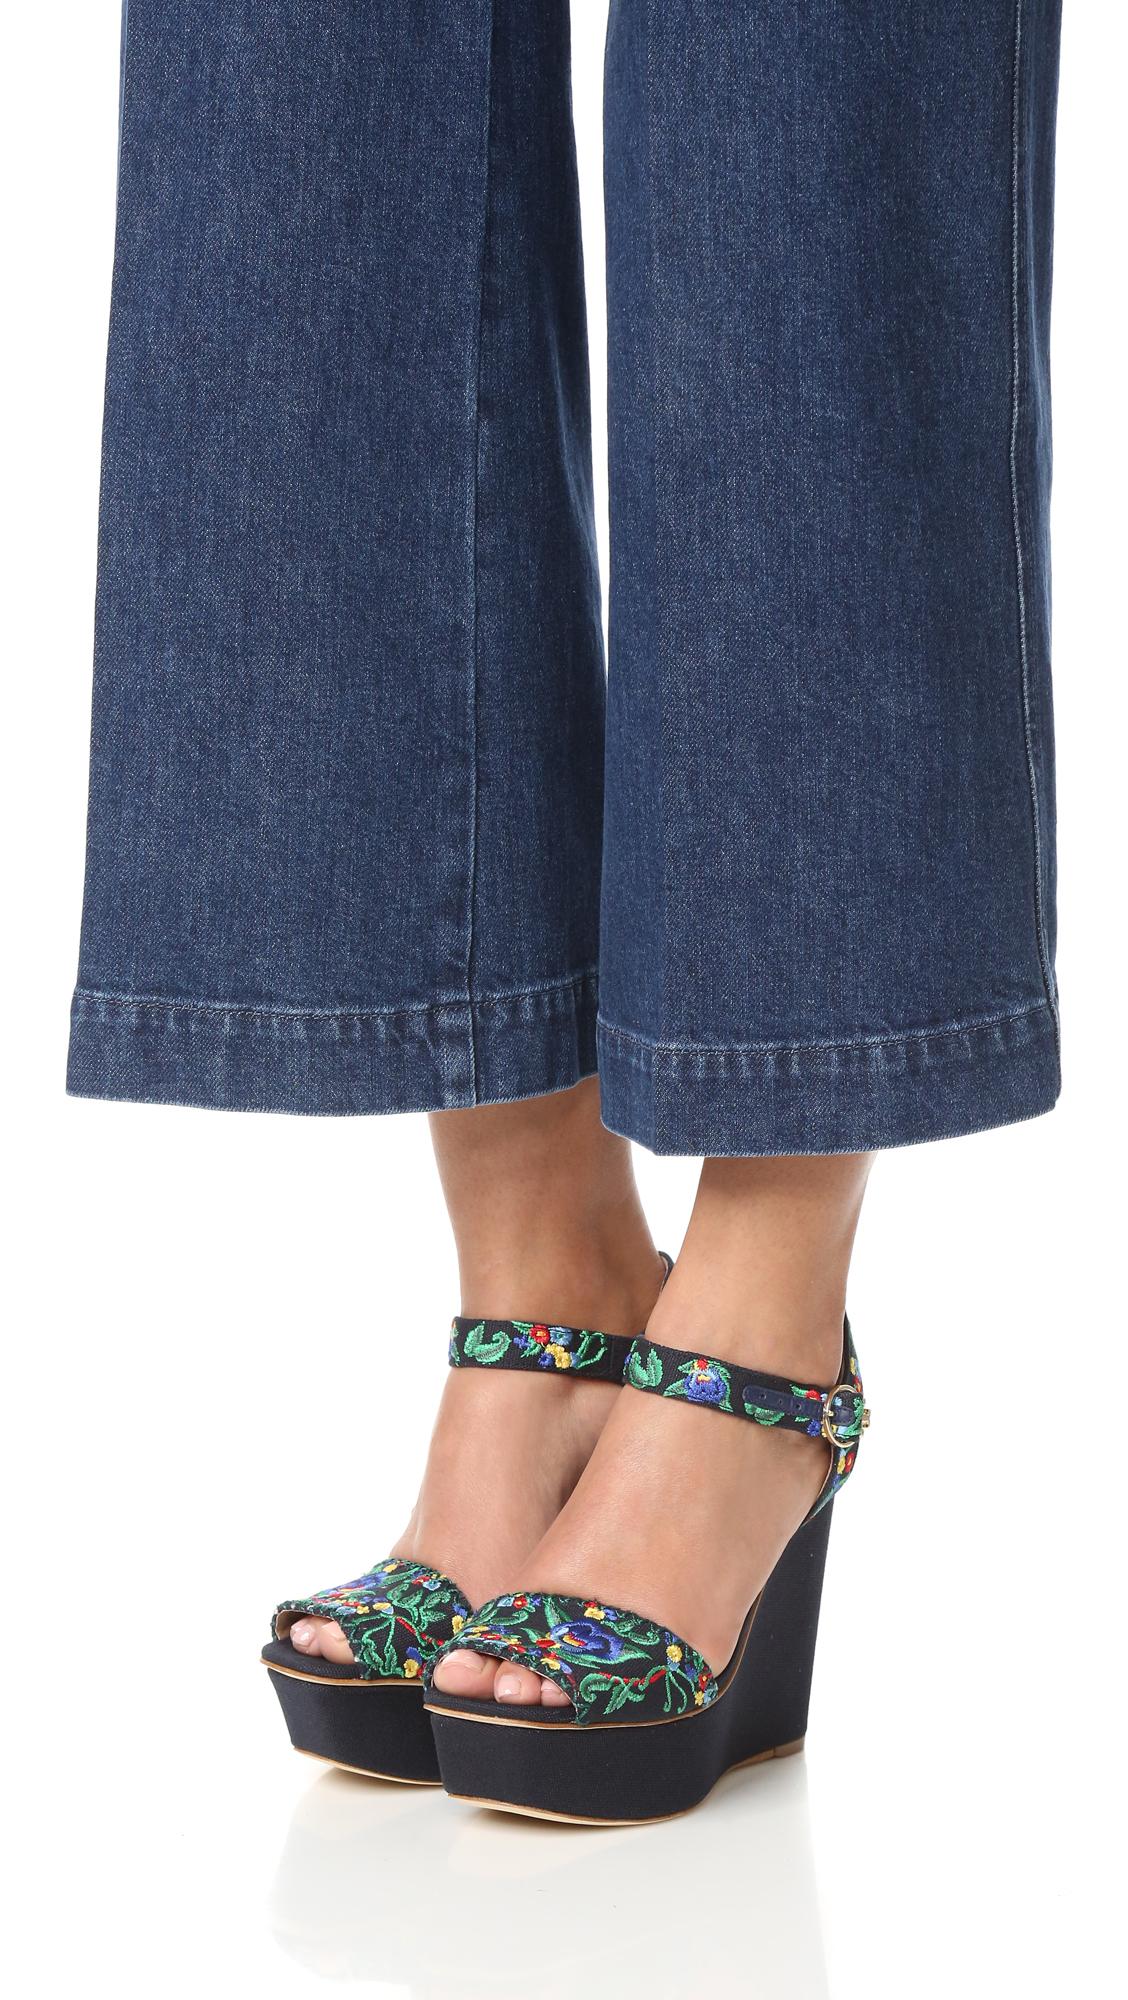 12e71f300005 Tory Burch Sonoma Embroidered Platform Sandals